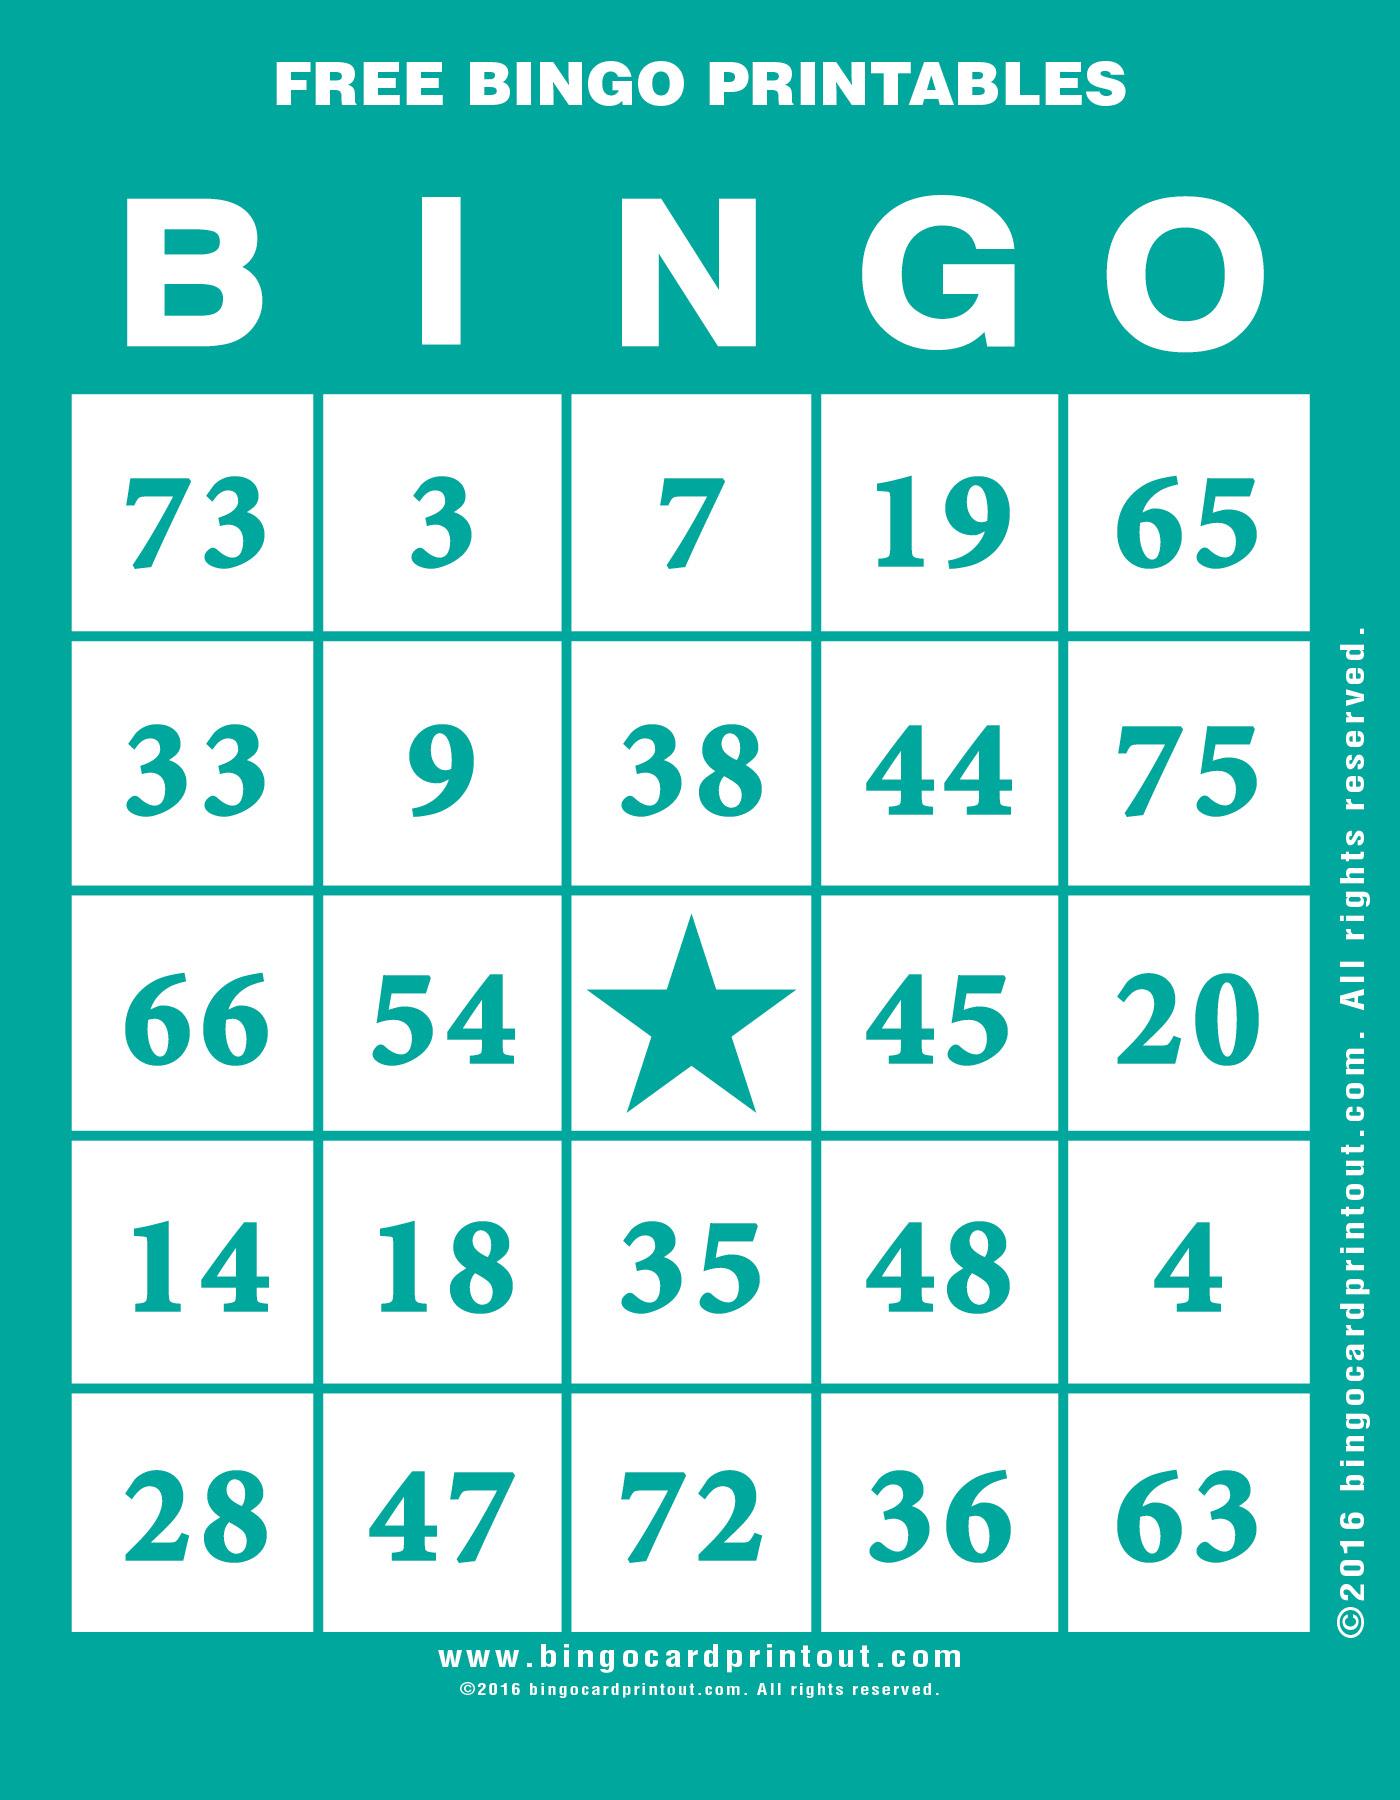 Free Bingo Printables - BingoCardPrintout.com